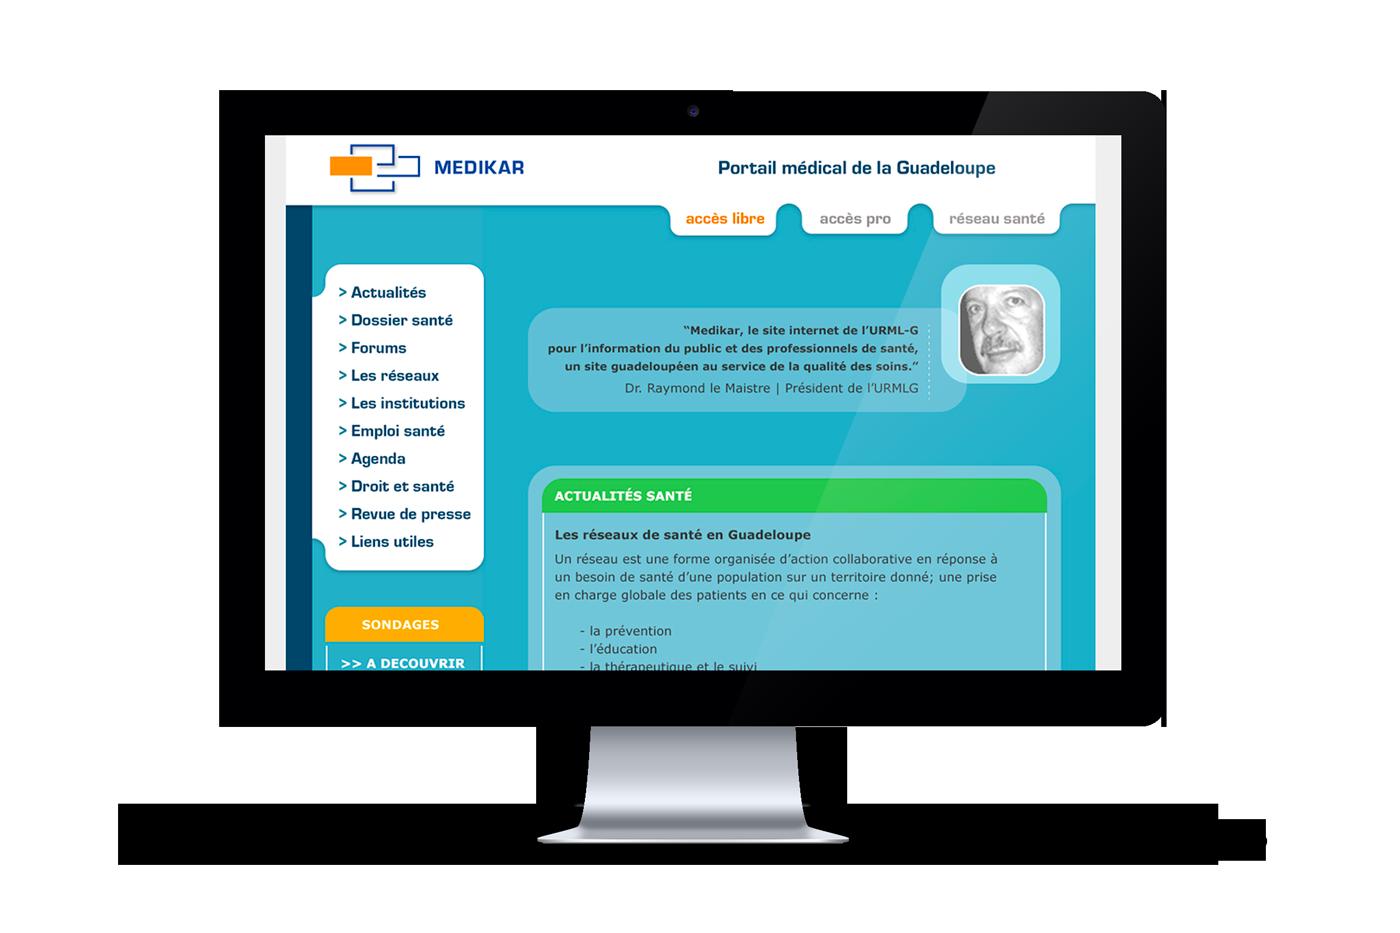 Medikar Website Accueil